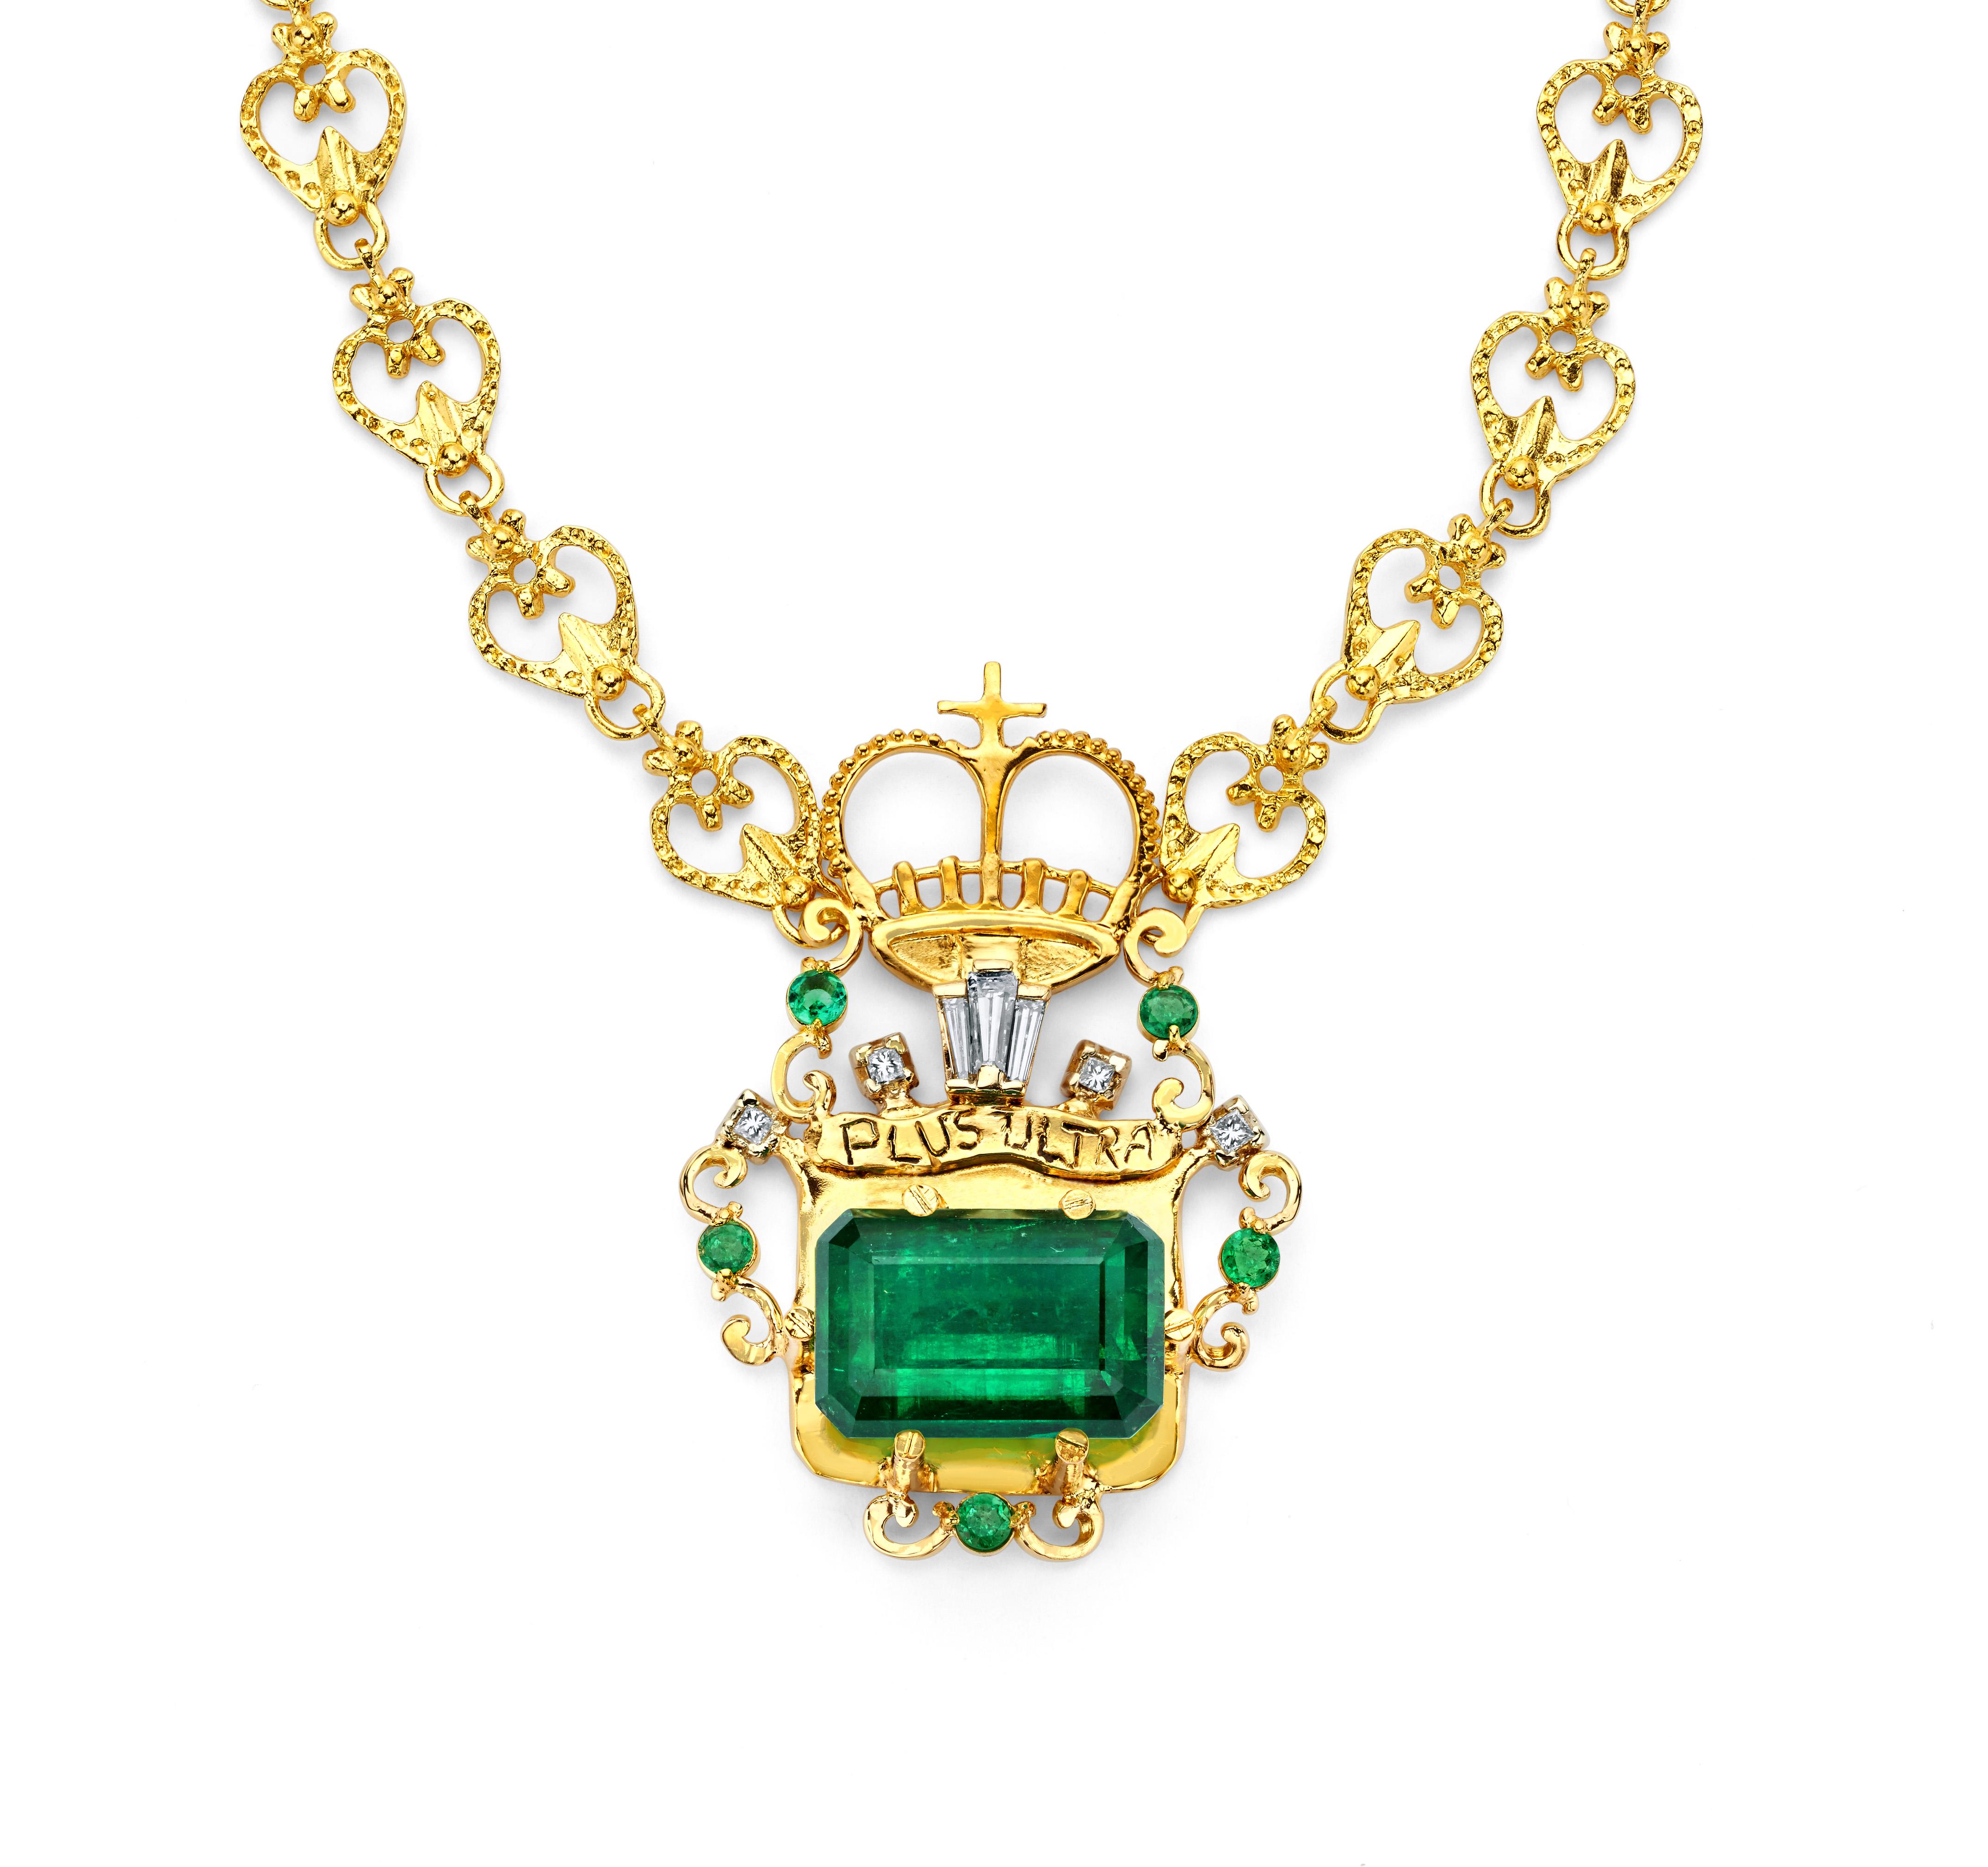 Emeralds discovered on the Spanish galleon Nuestra Señora de Atocha